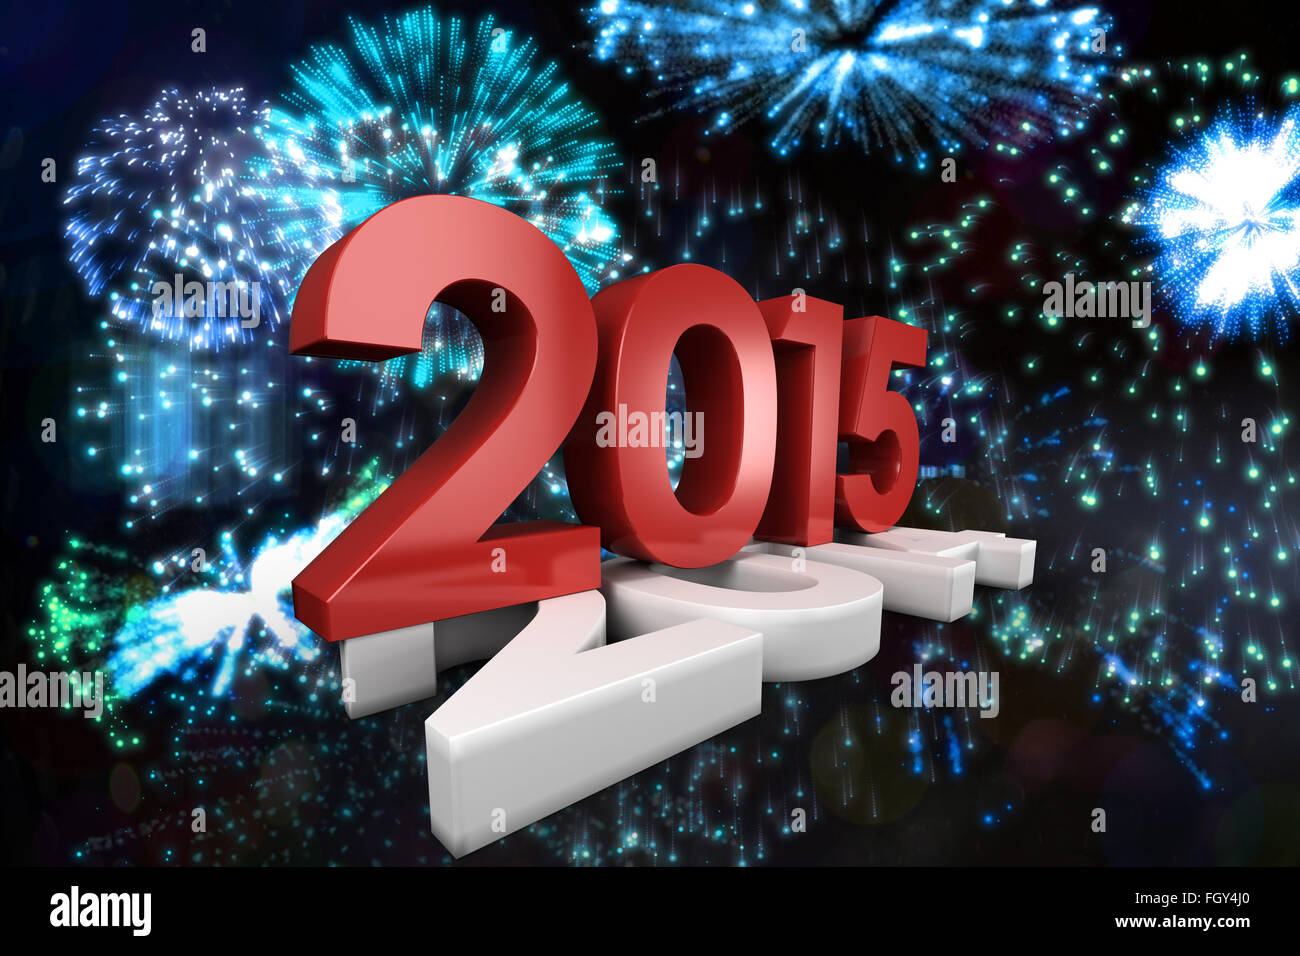 Composite image of 2015 squashing 2014 - Stock Image